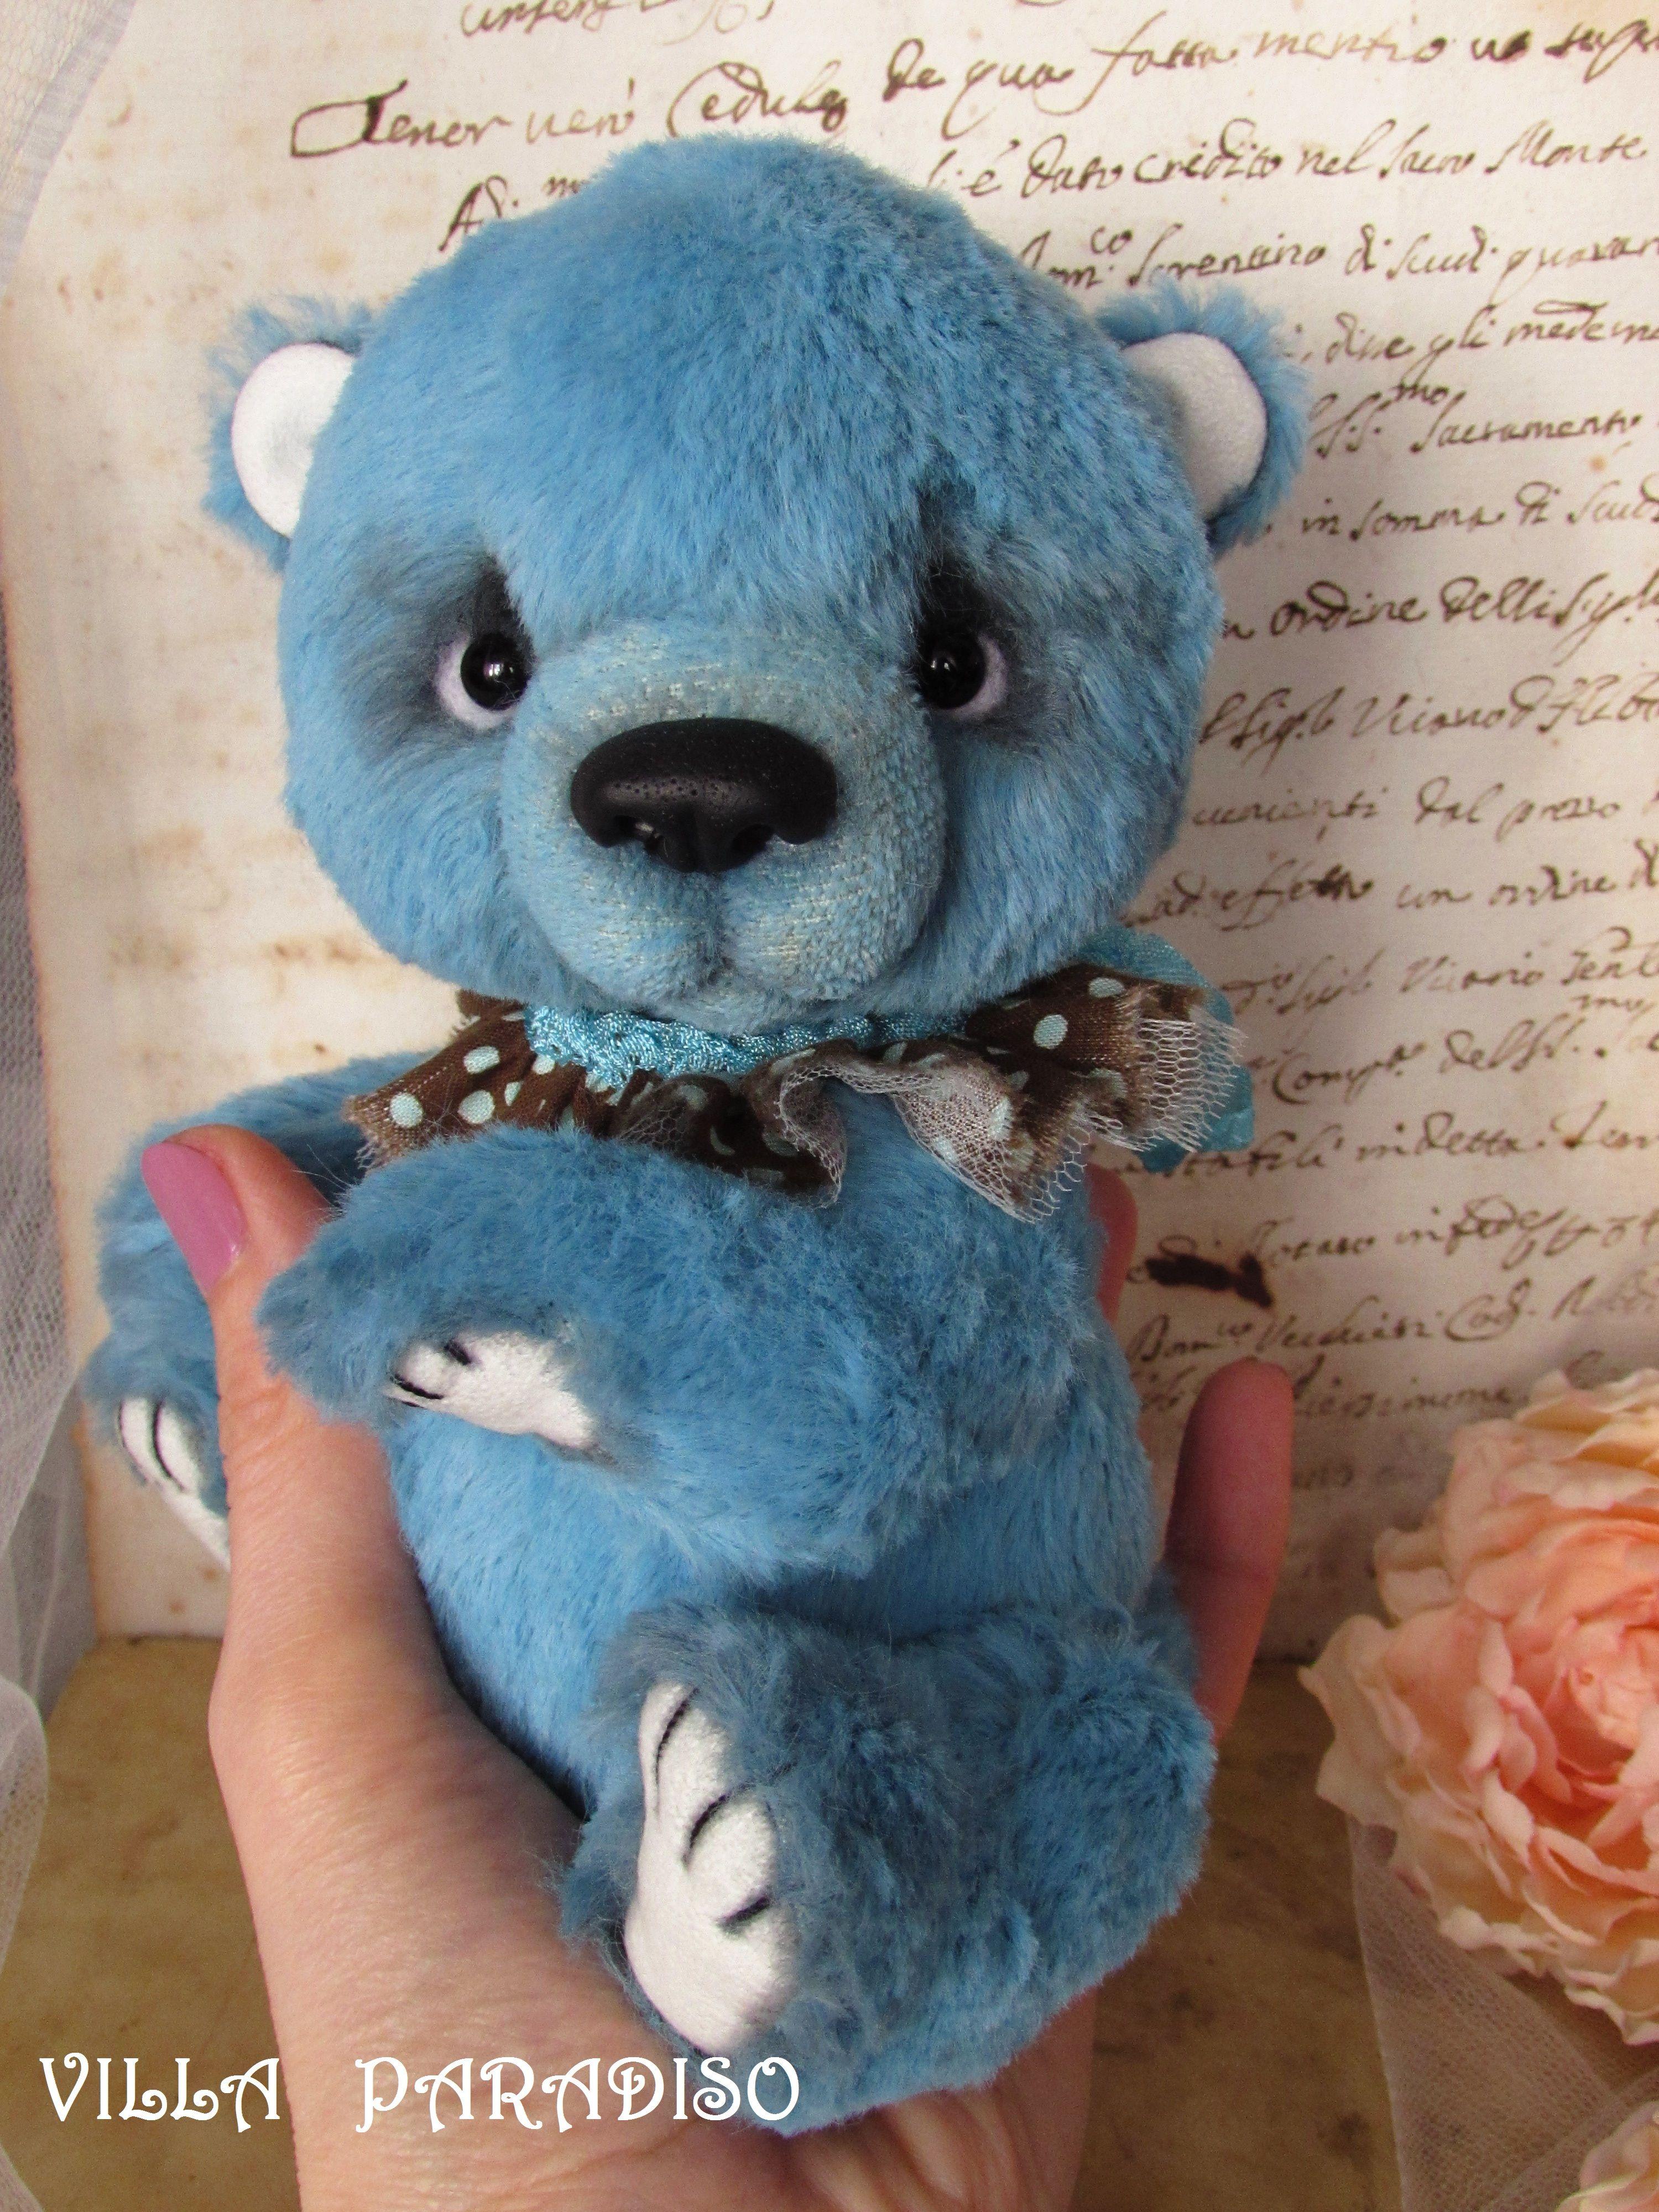 Artist teddy bear OOAK by Villa Paradiso